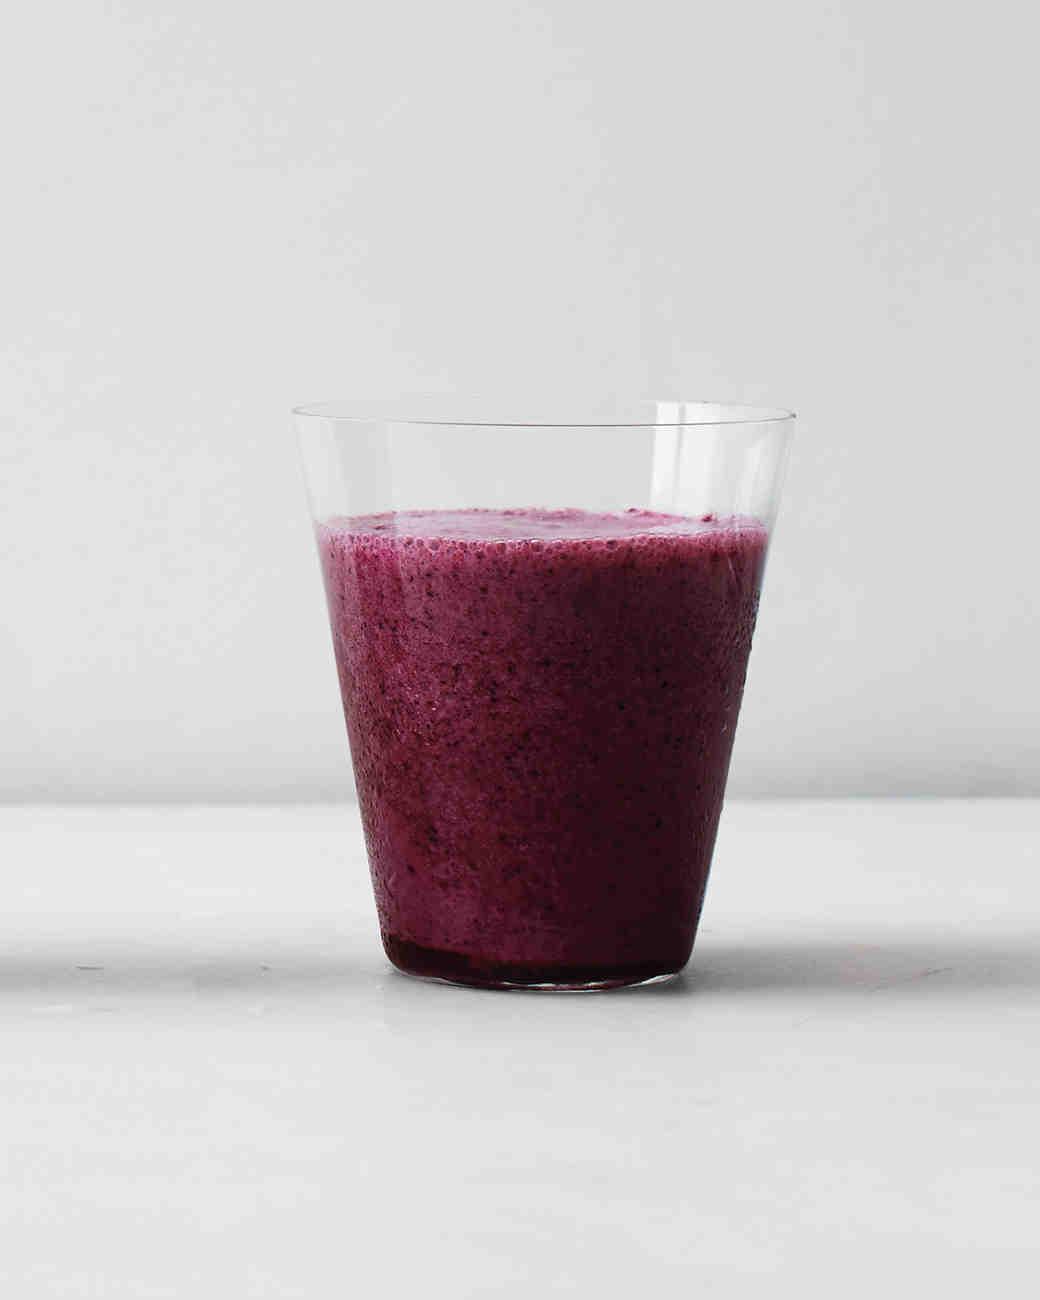 clean-slate-juice-mixed-berry-tofu-smoothie-0115.jpg